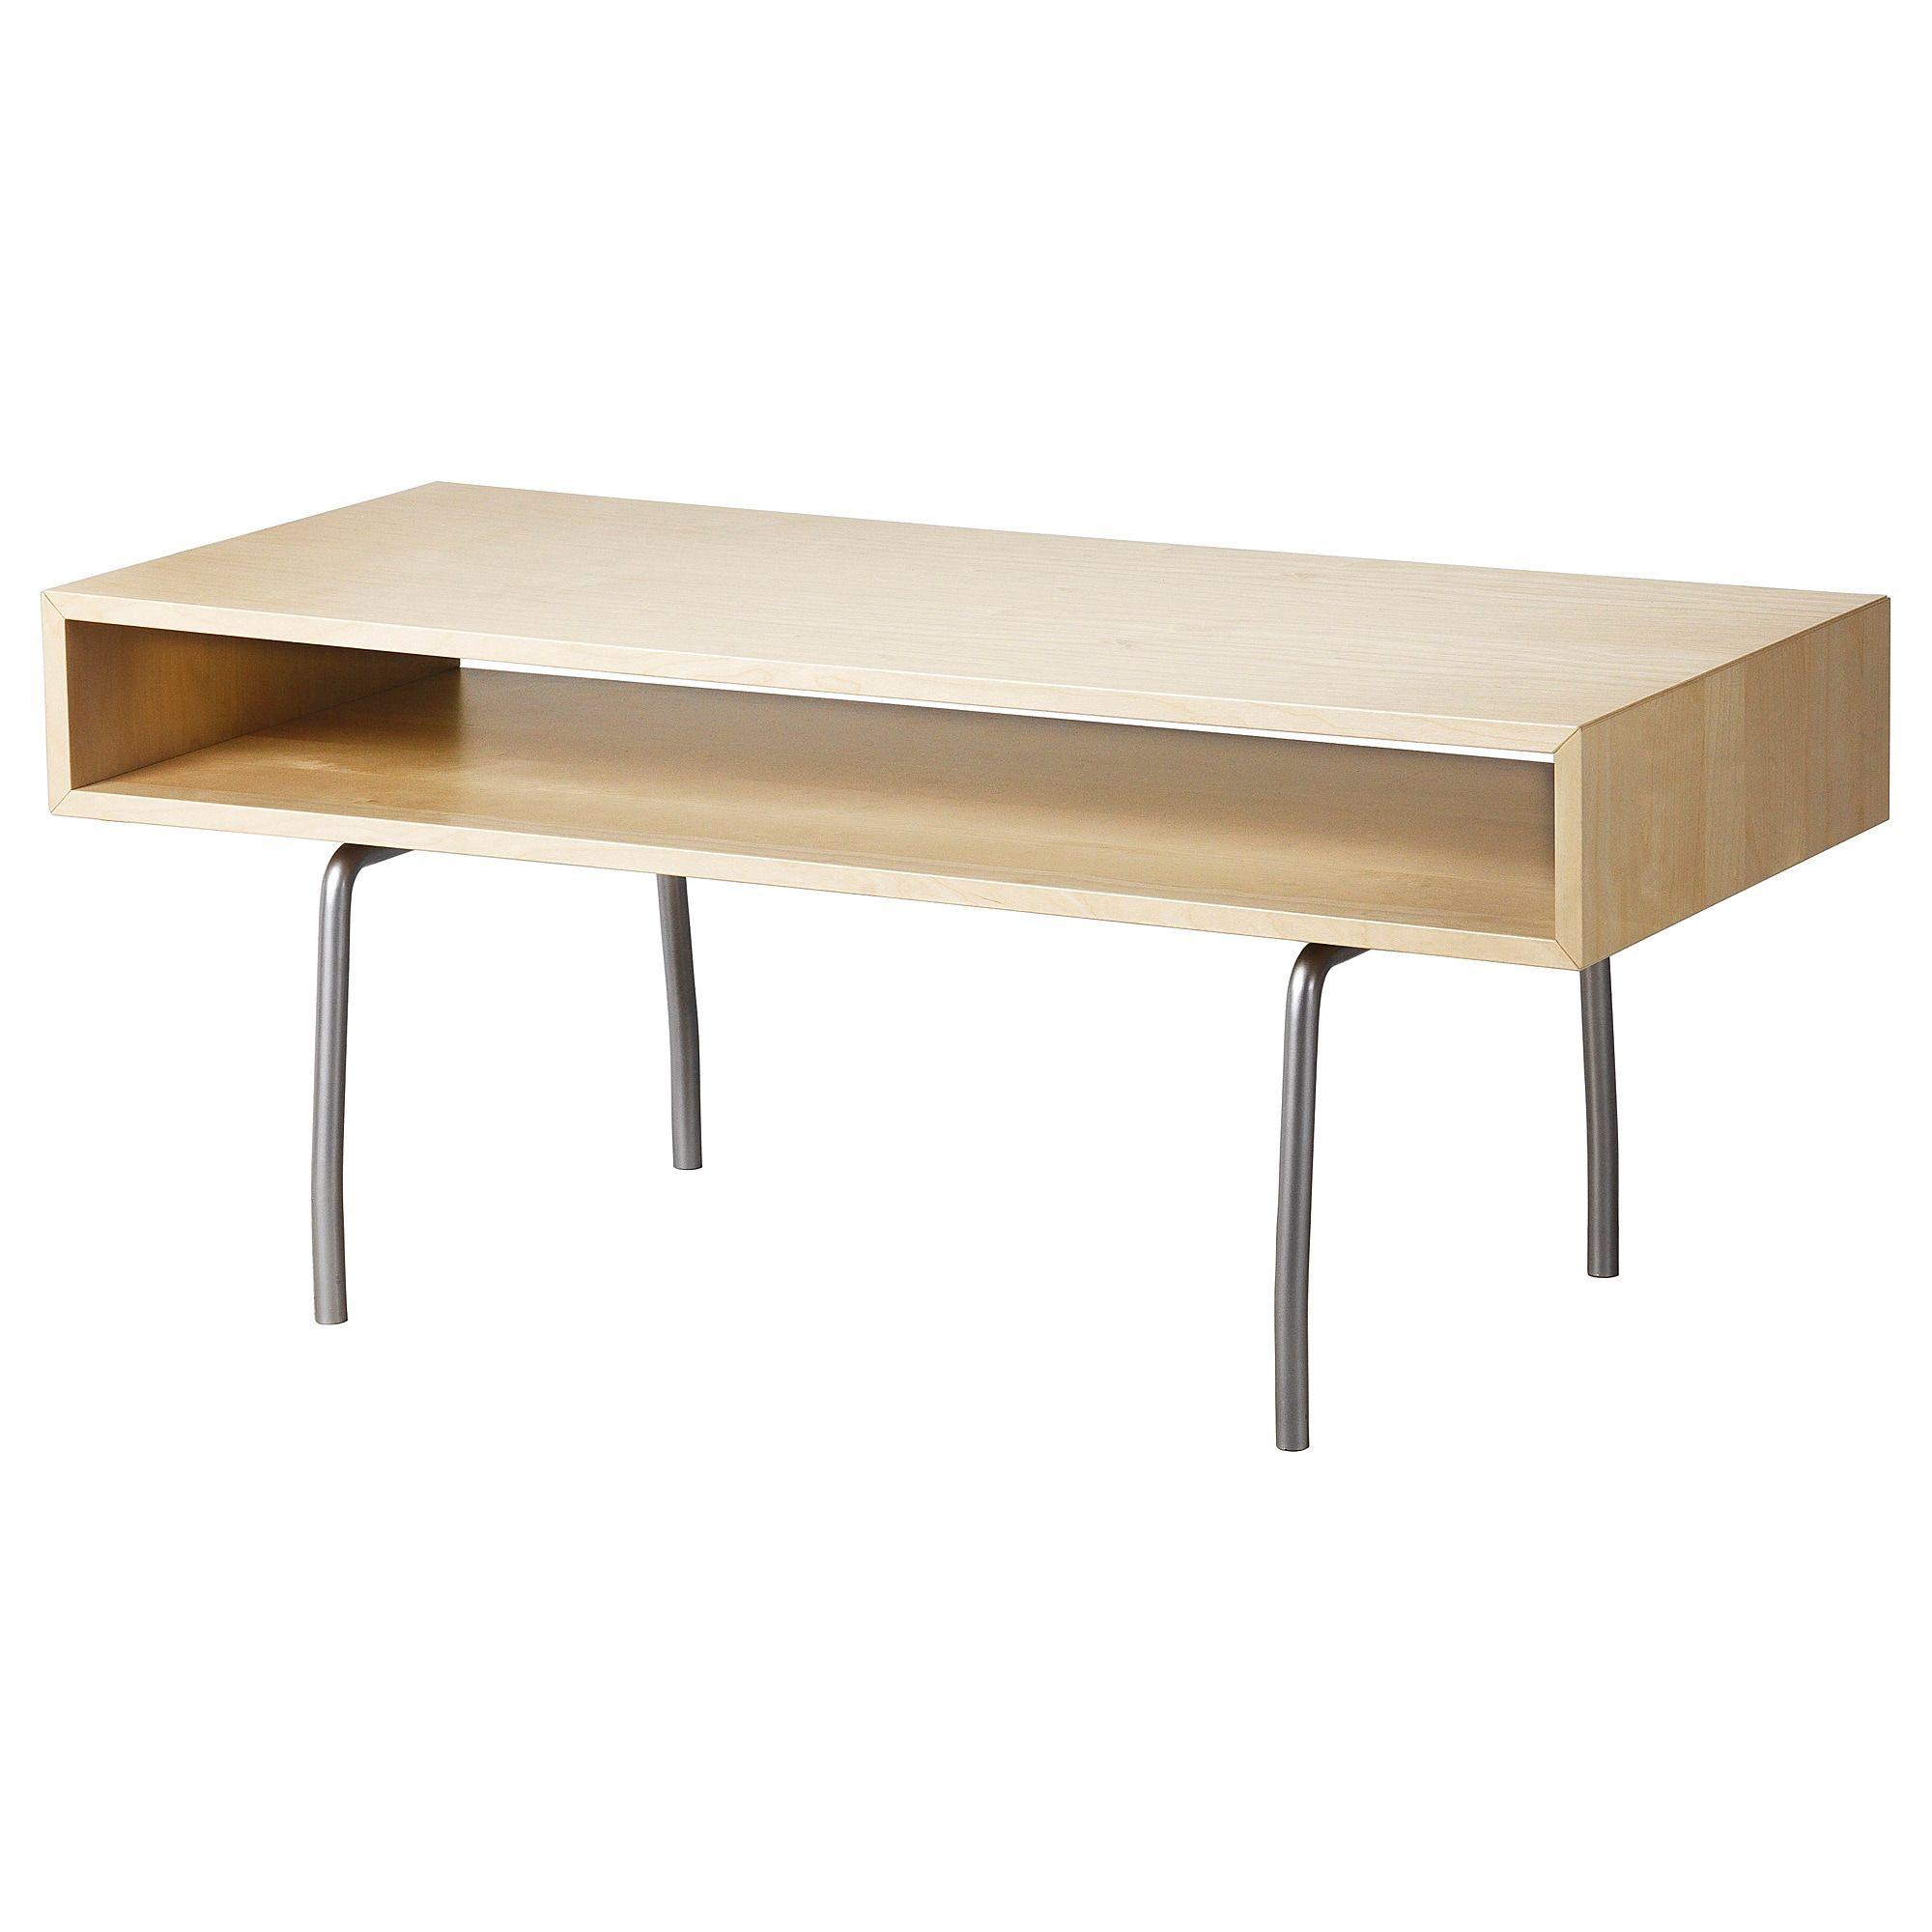 Furniture and Home Furnishings Ikea coffee table, Ikea